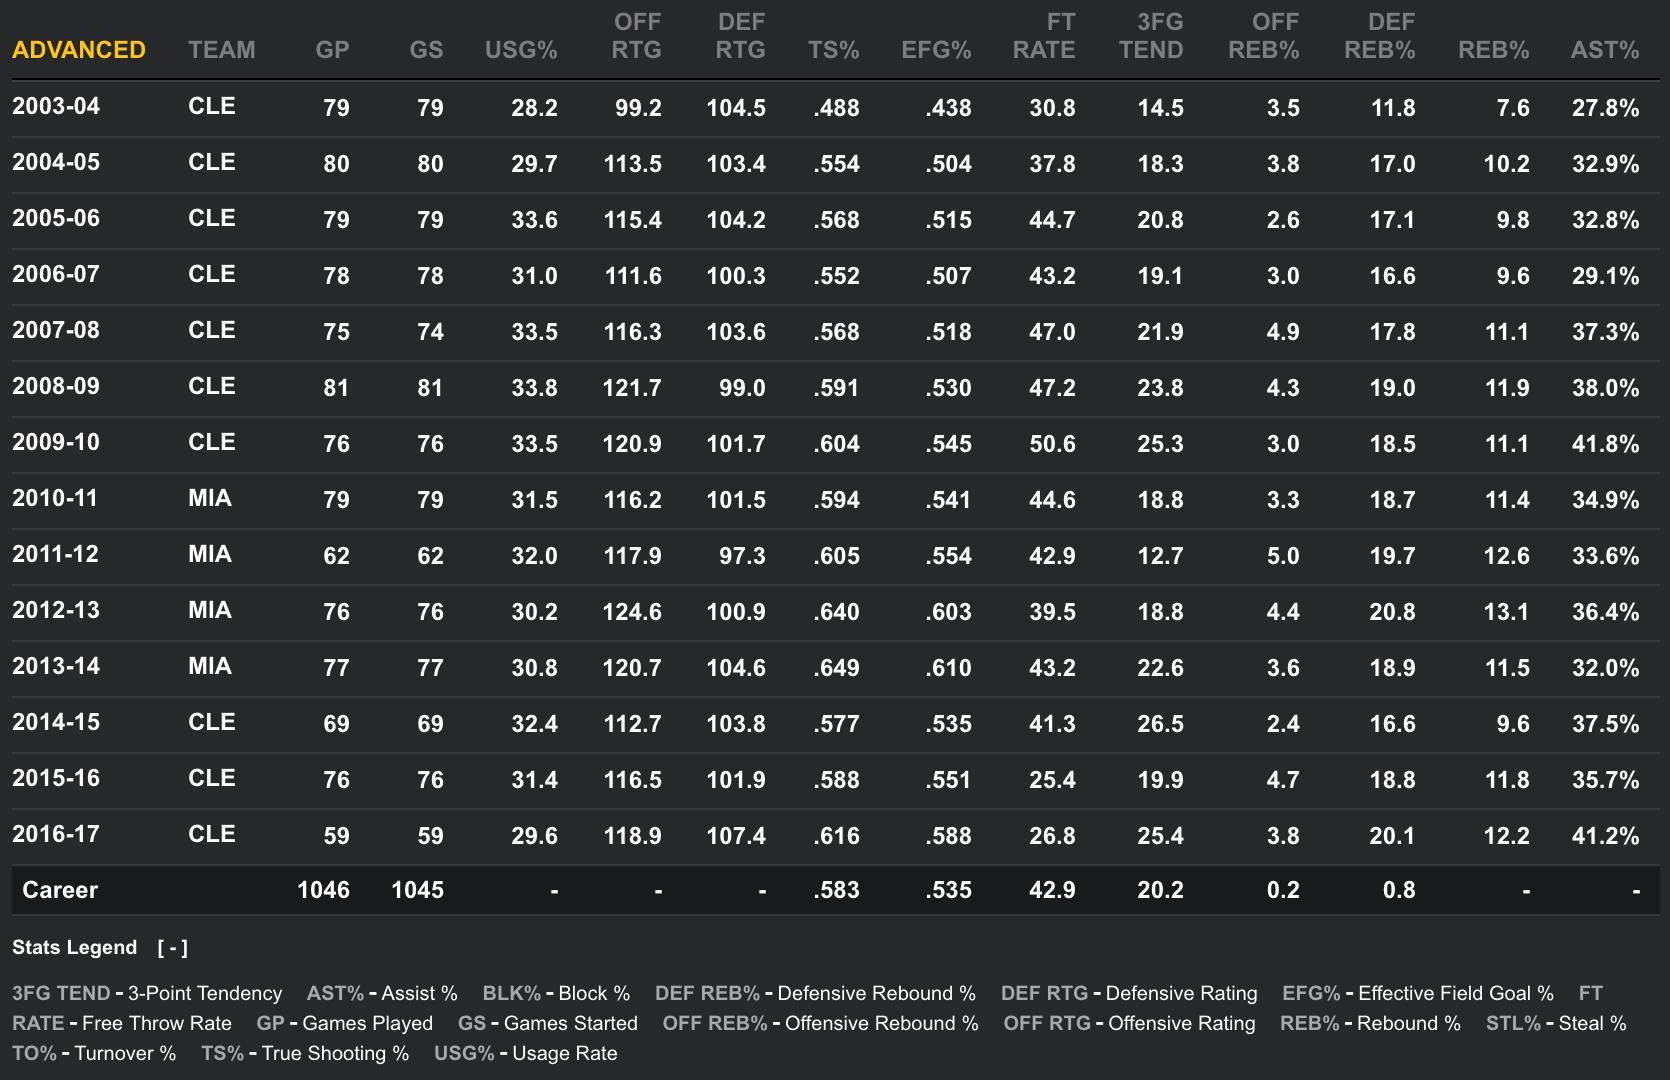 LeBron James Advanced Stats